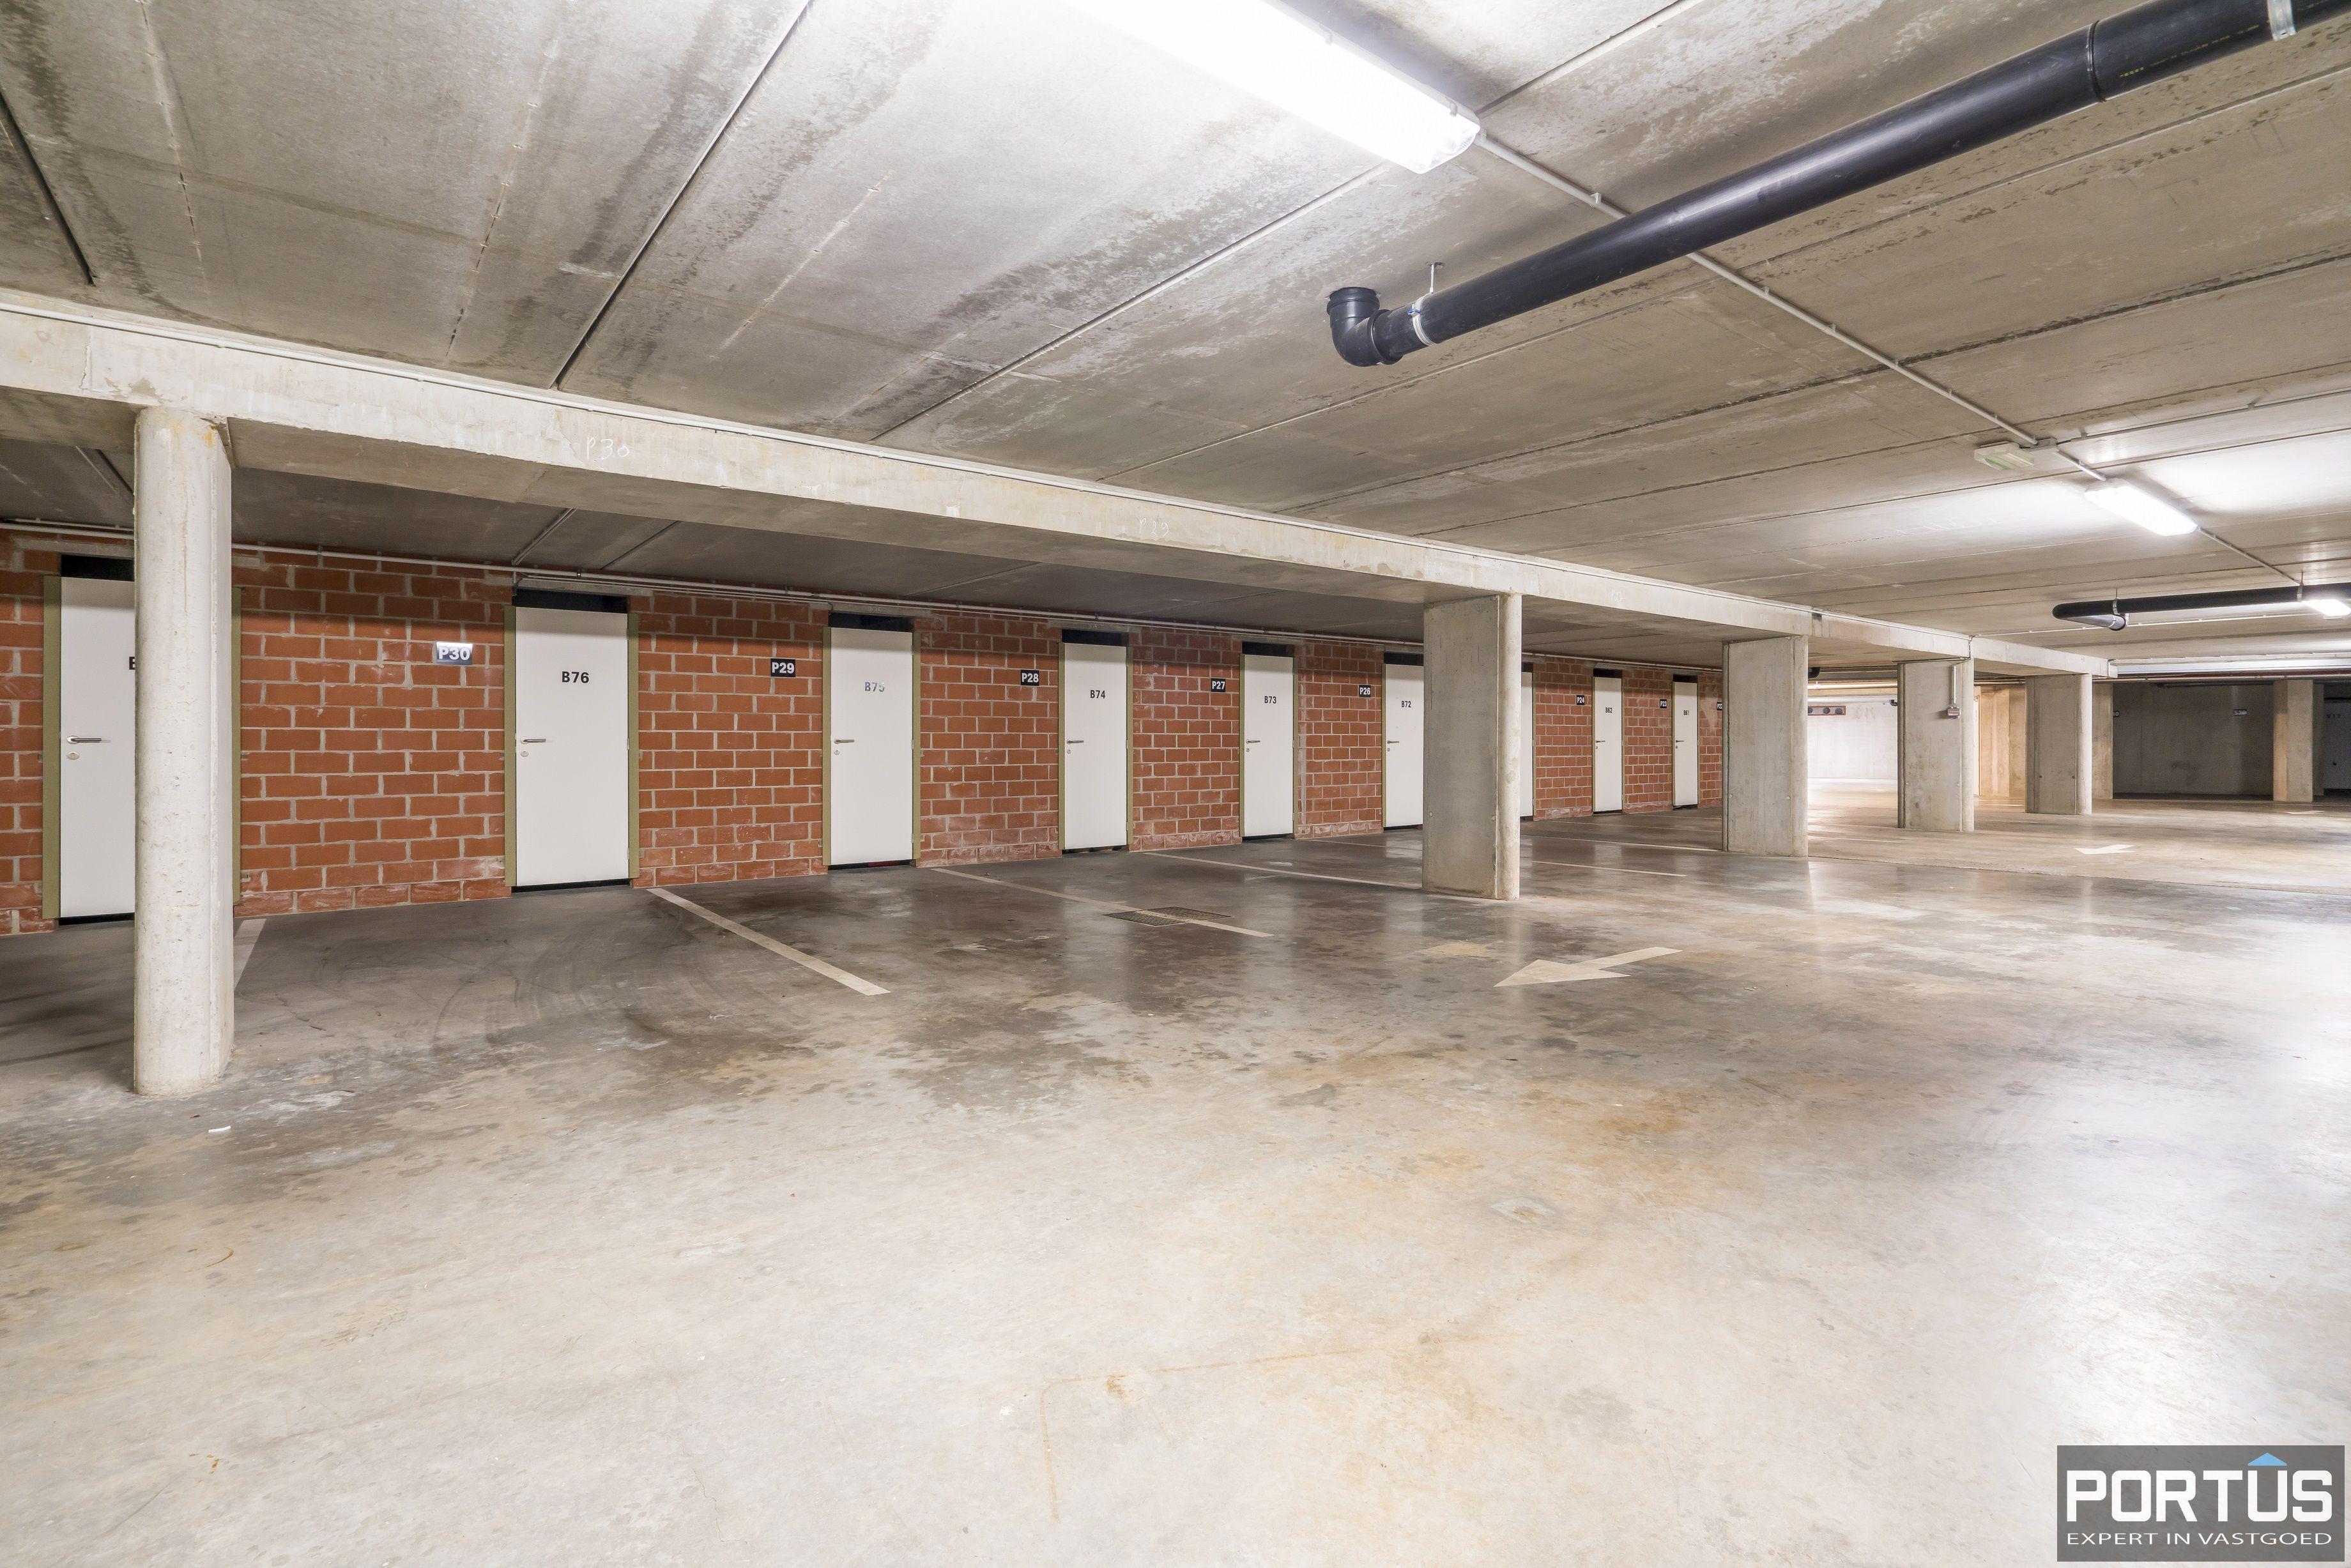 Appartement te koop met 2 slaapkamers in Residentie Waterfront te Nieuwpoort - 11877